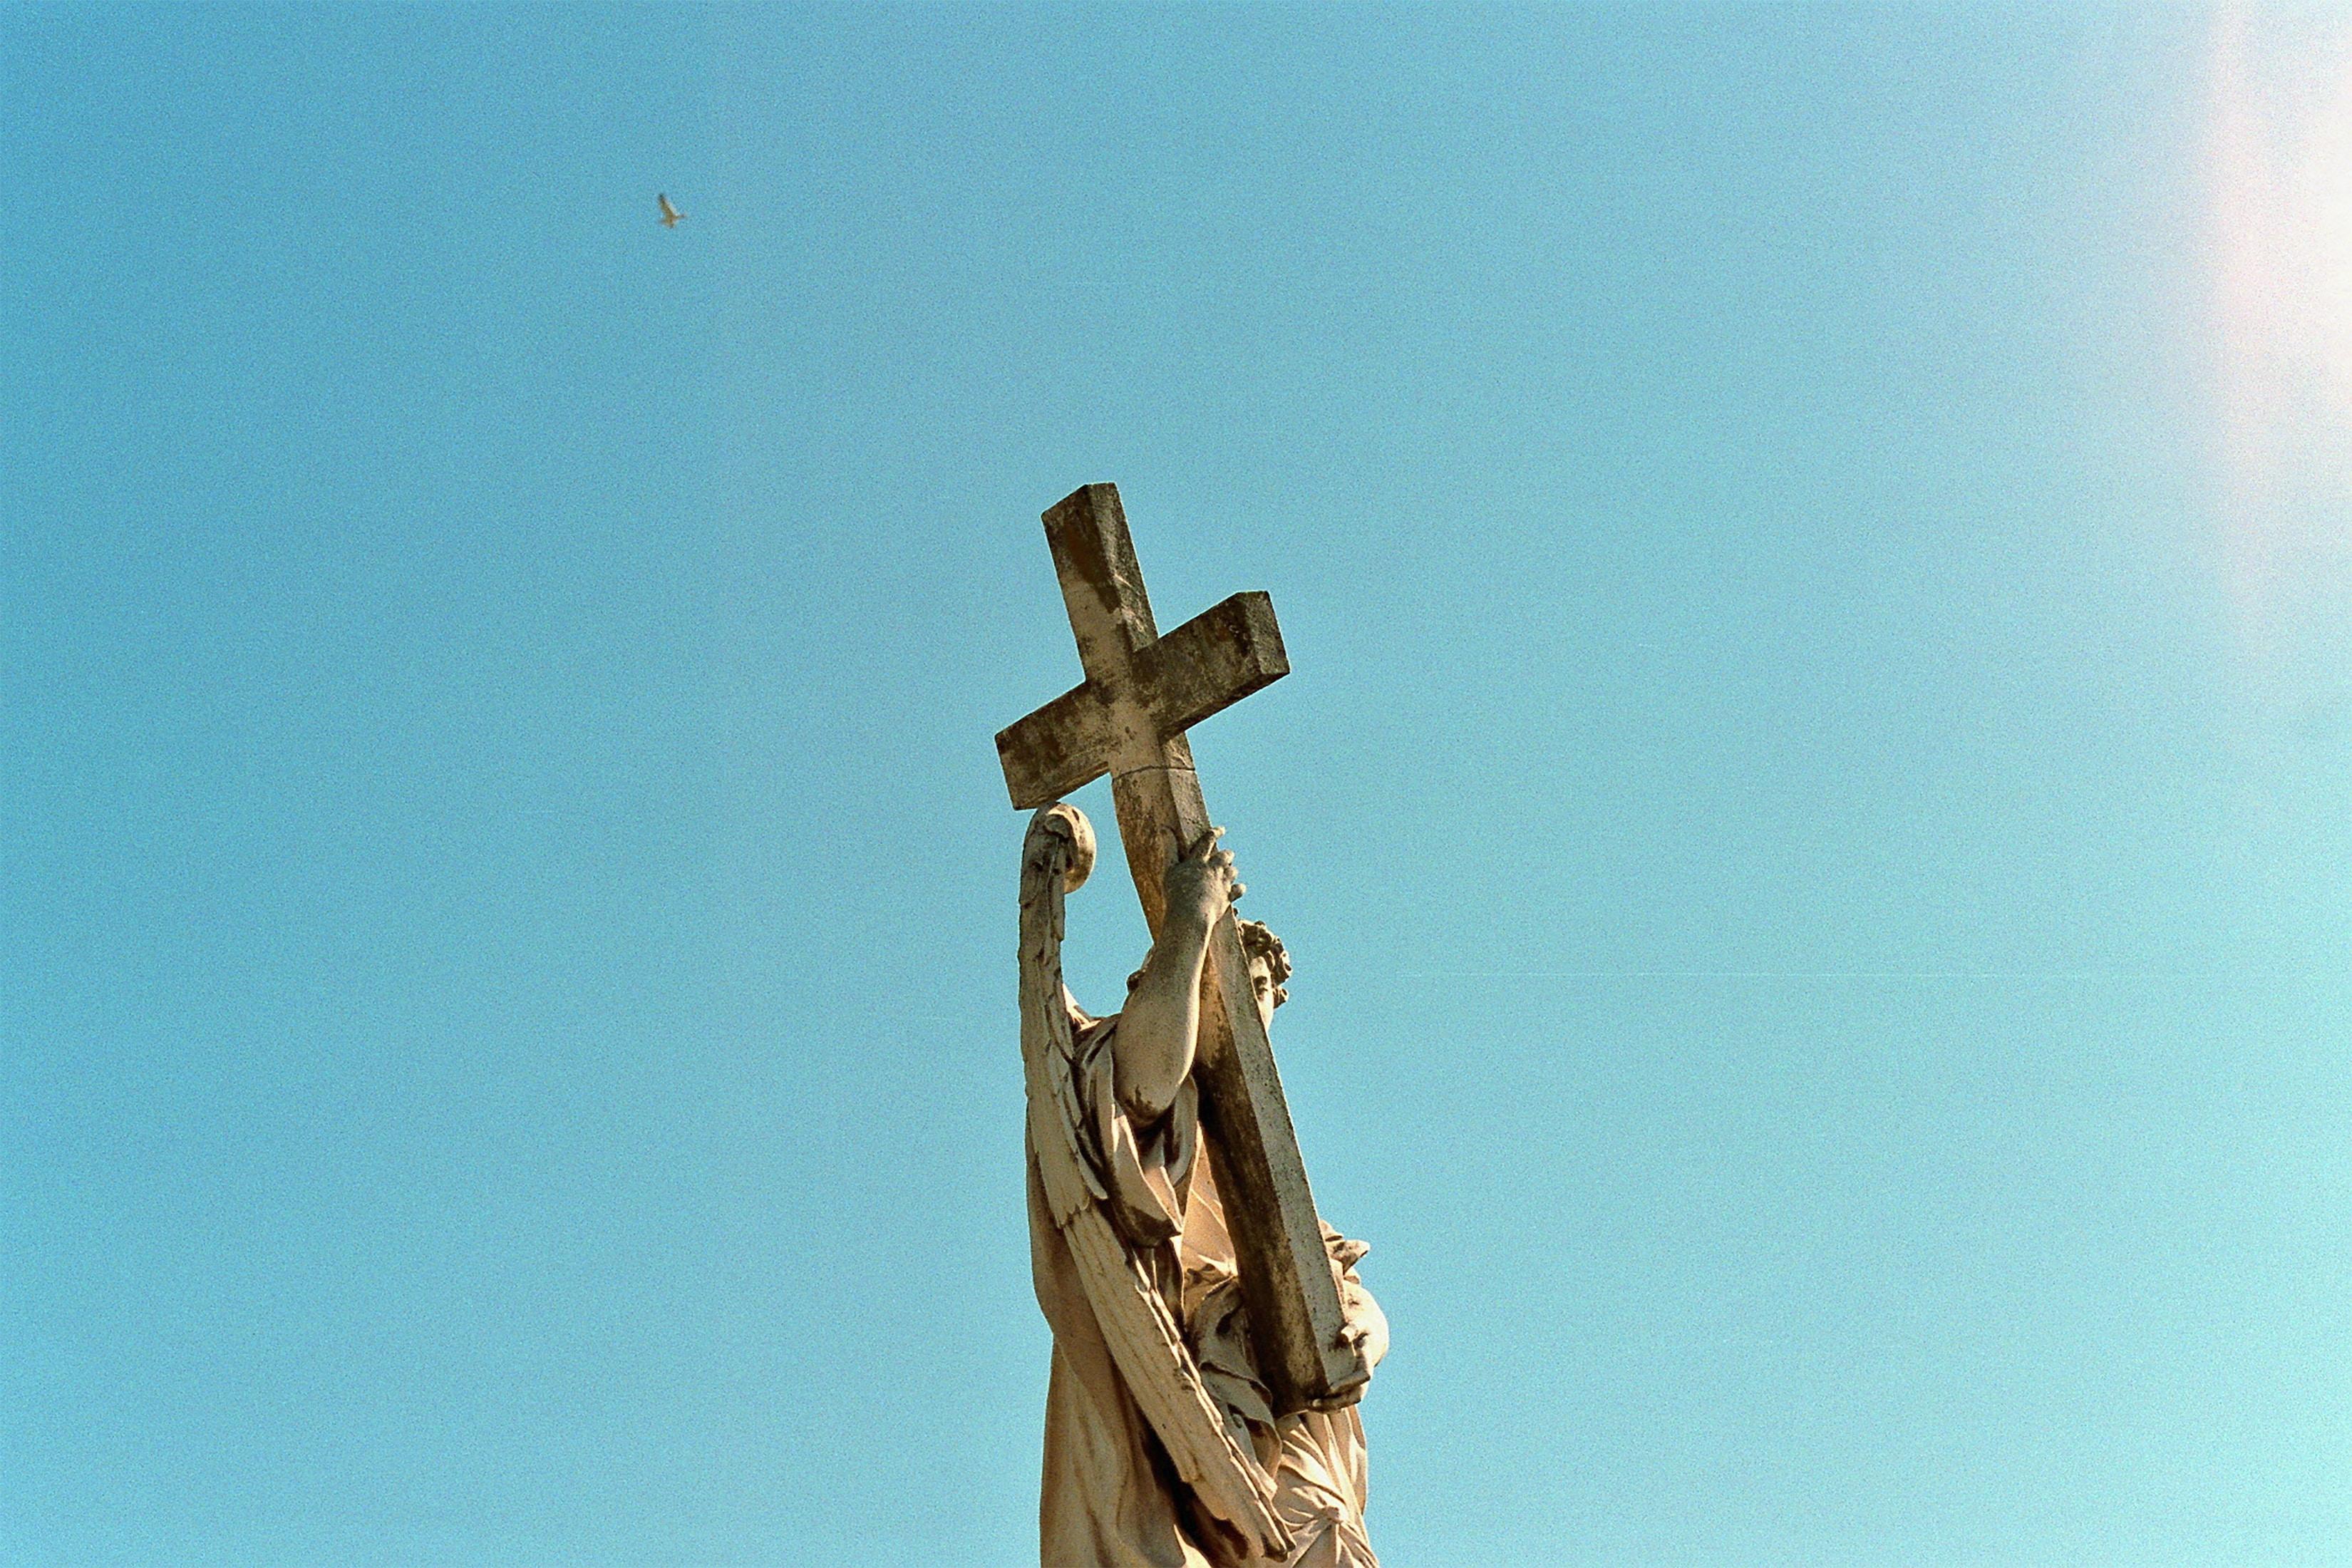 angel holding cross monument